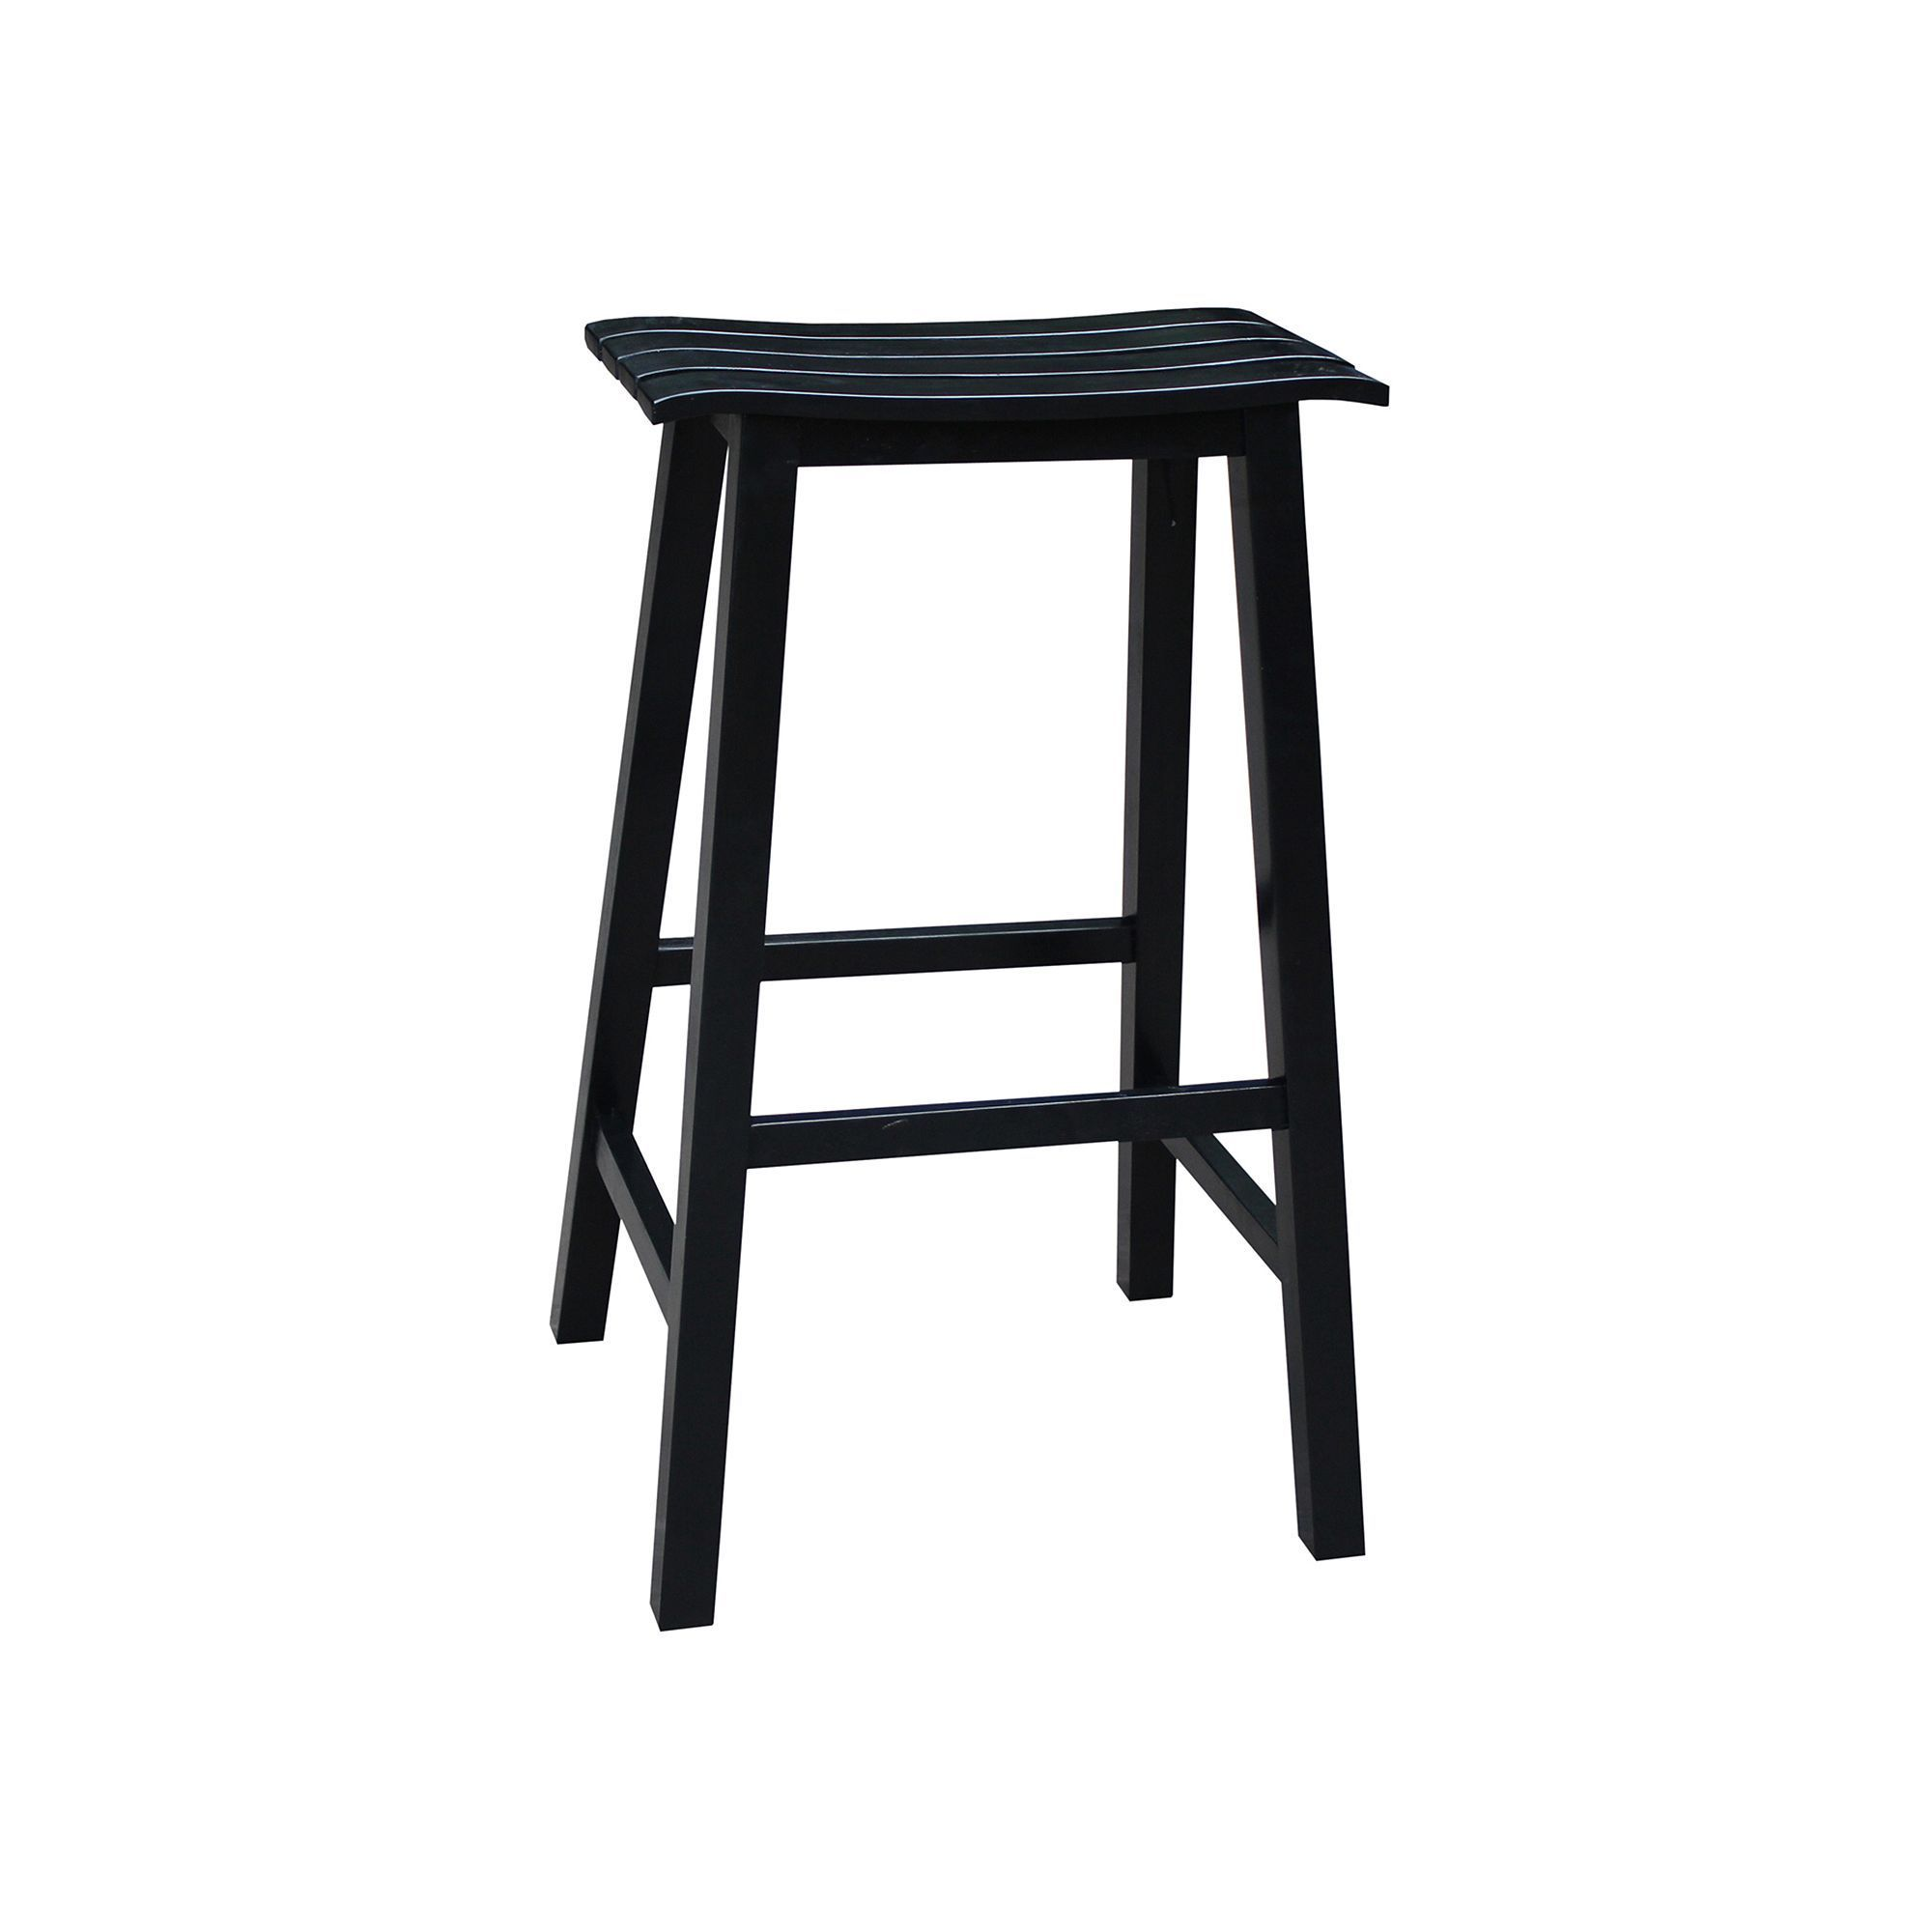 International concepts slated bar stool bar stools bar stool and